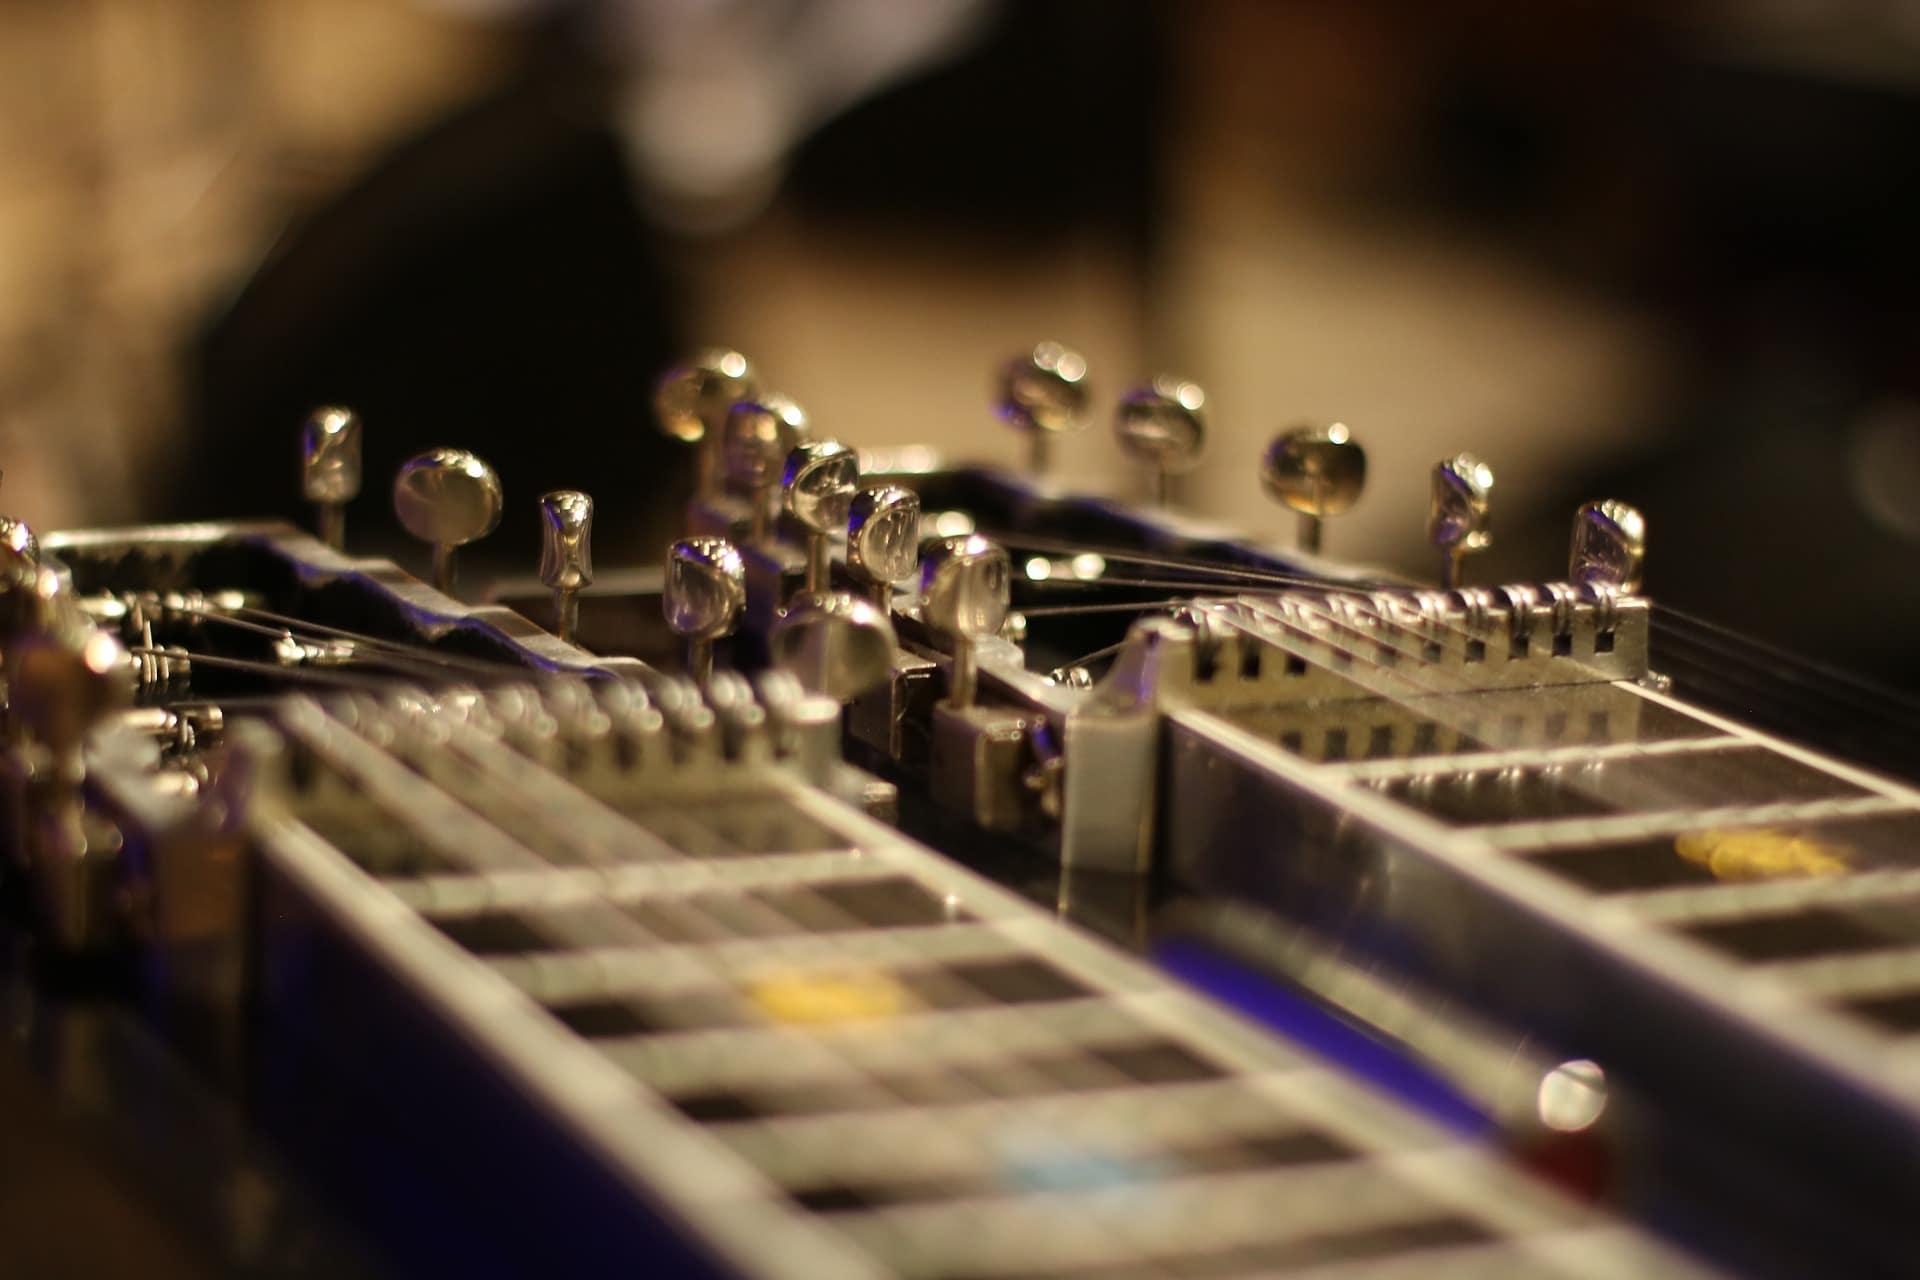 Closeup of guitar neck